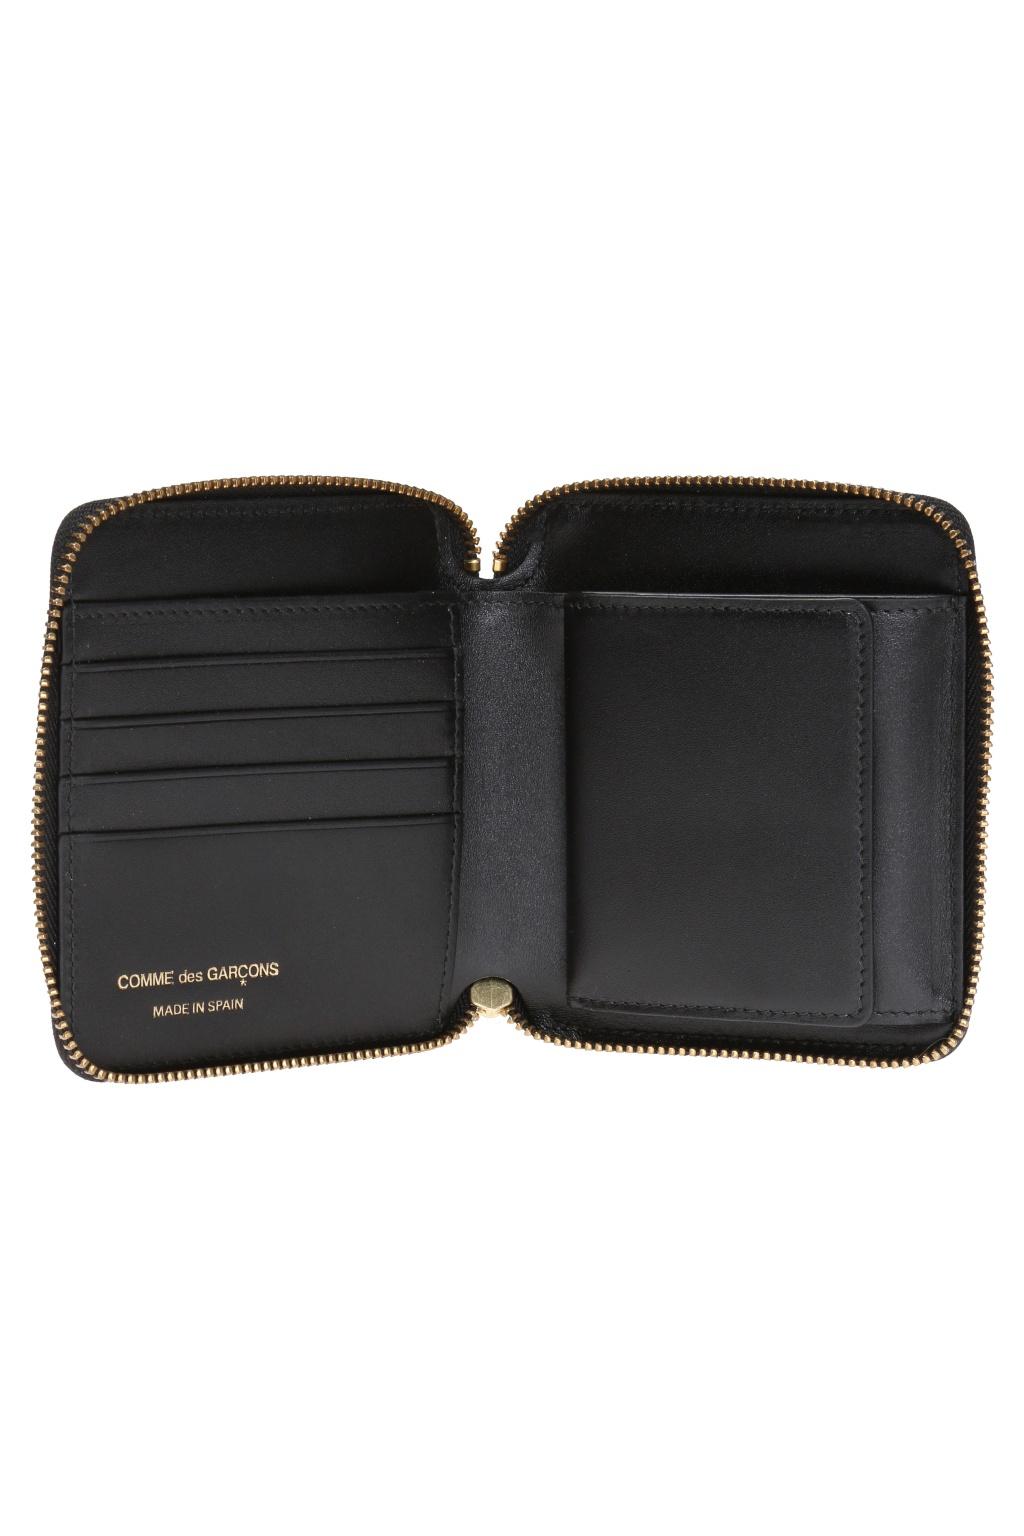 Comme des Garcons Embossed wallet